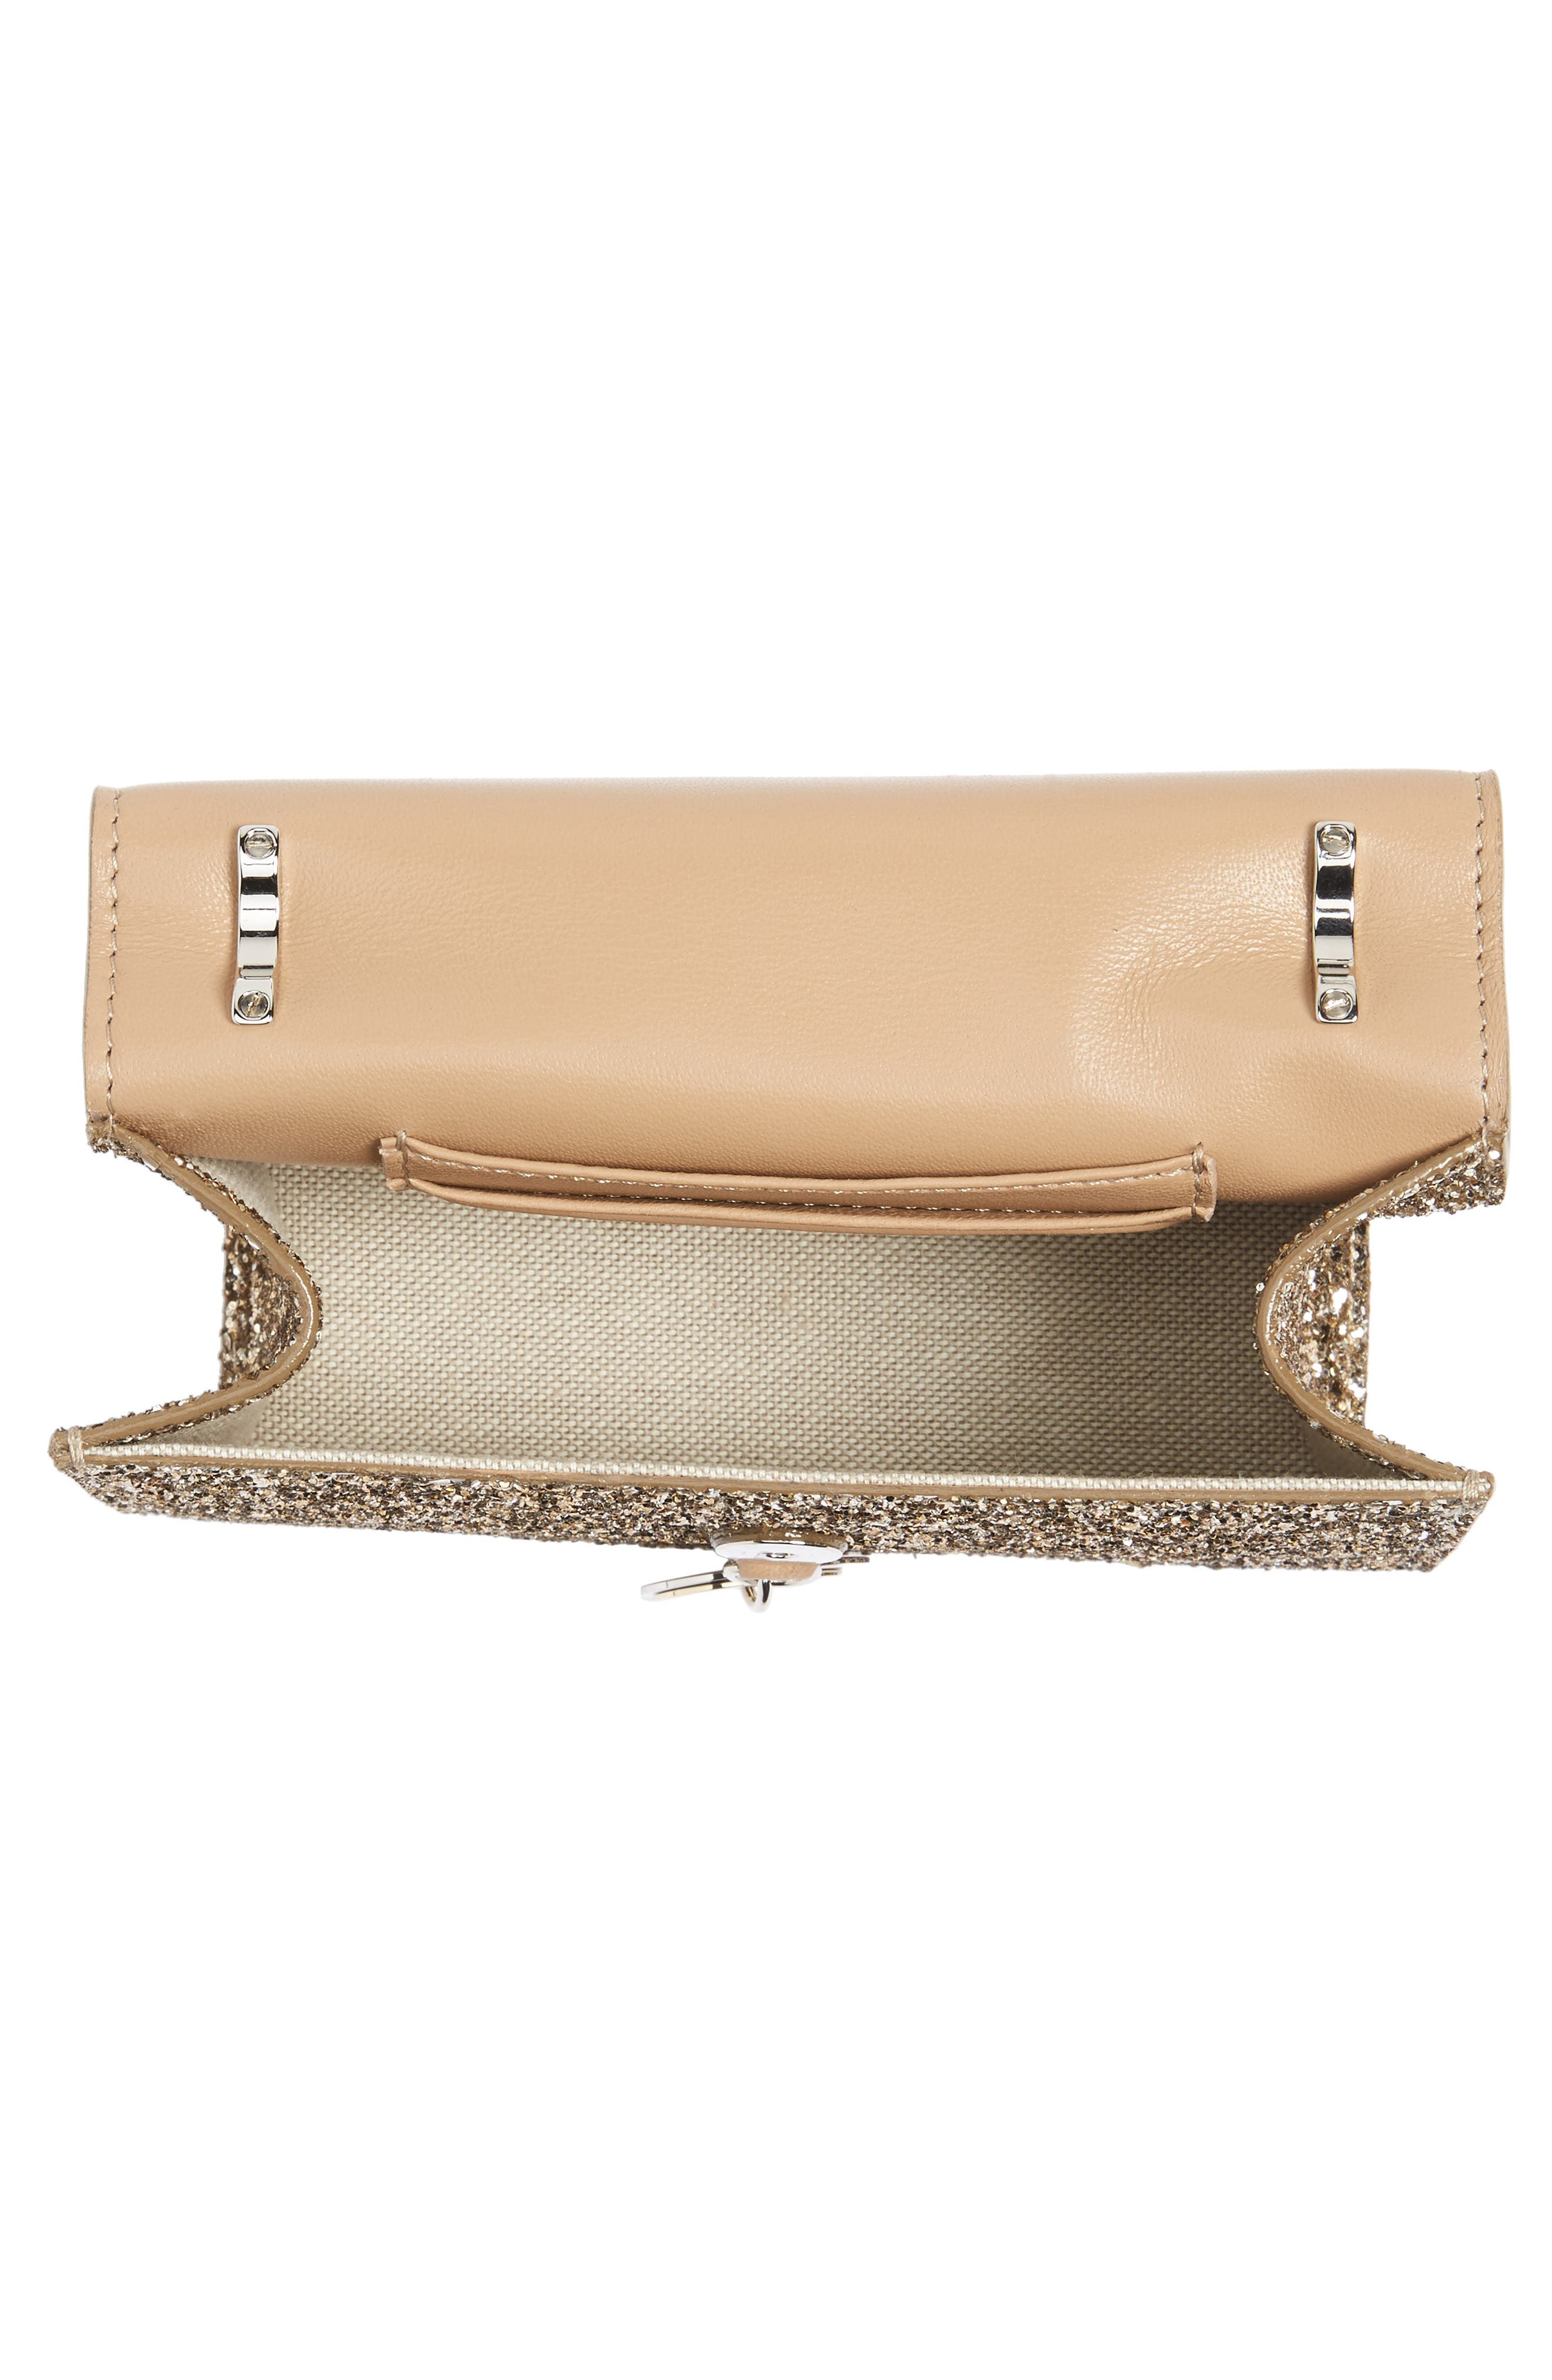 Finley Shadow Glitter Shoulder Bag,                             Alternate thumbnail 4, color,                             Antique Gold